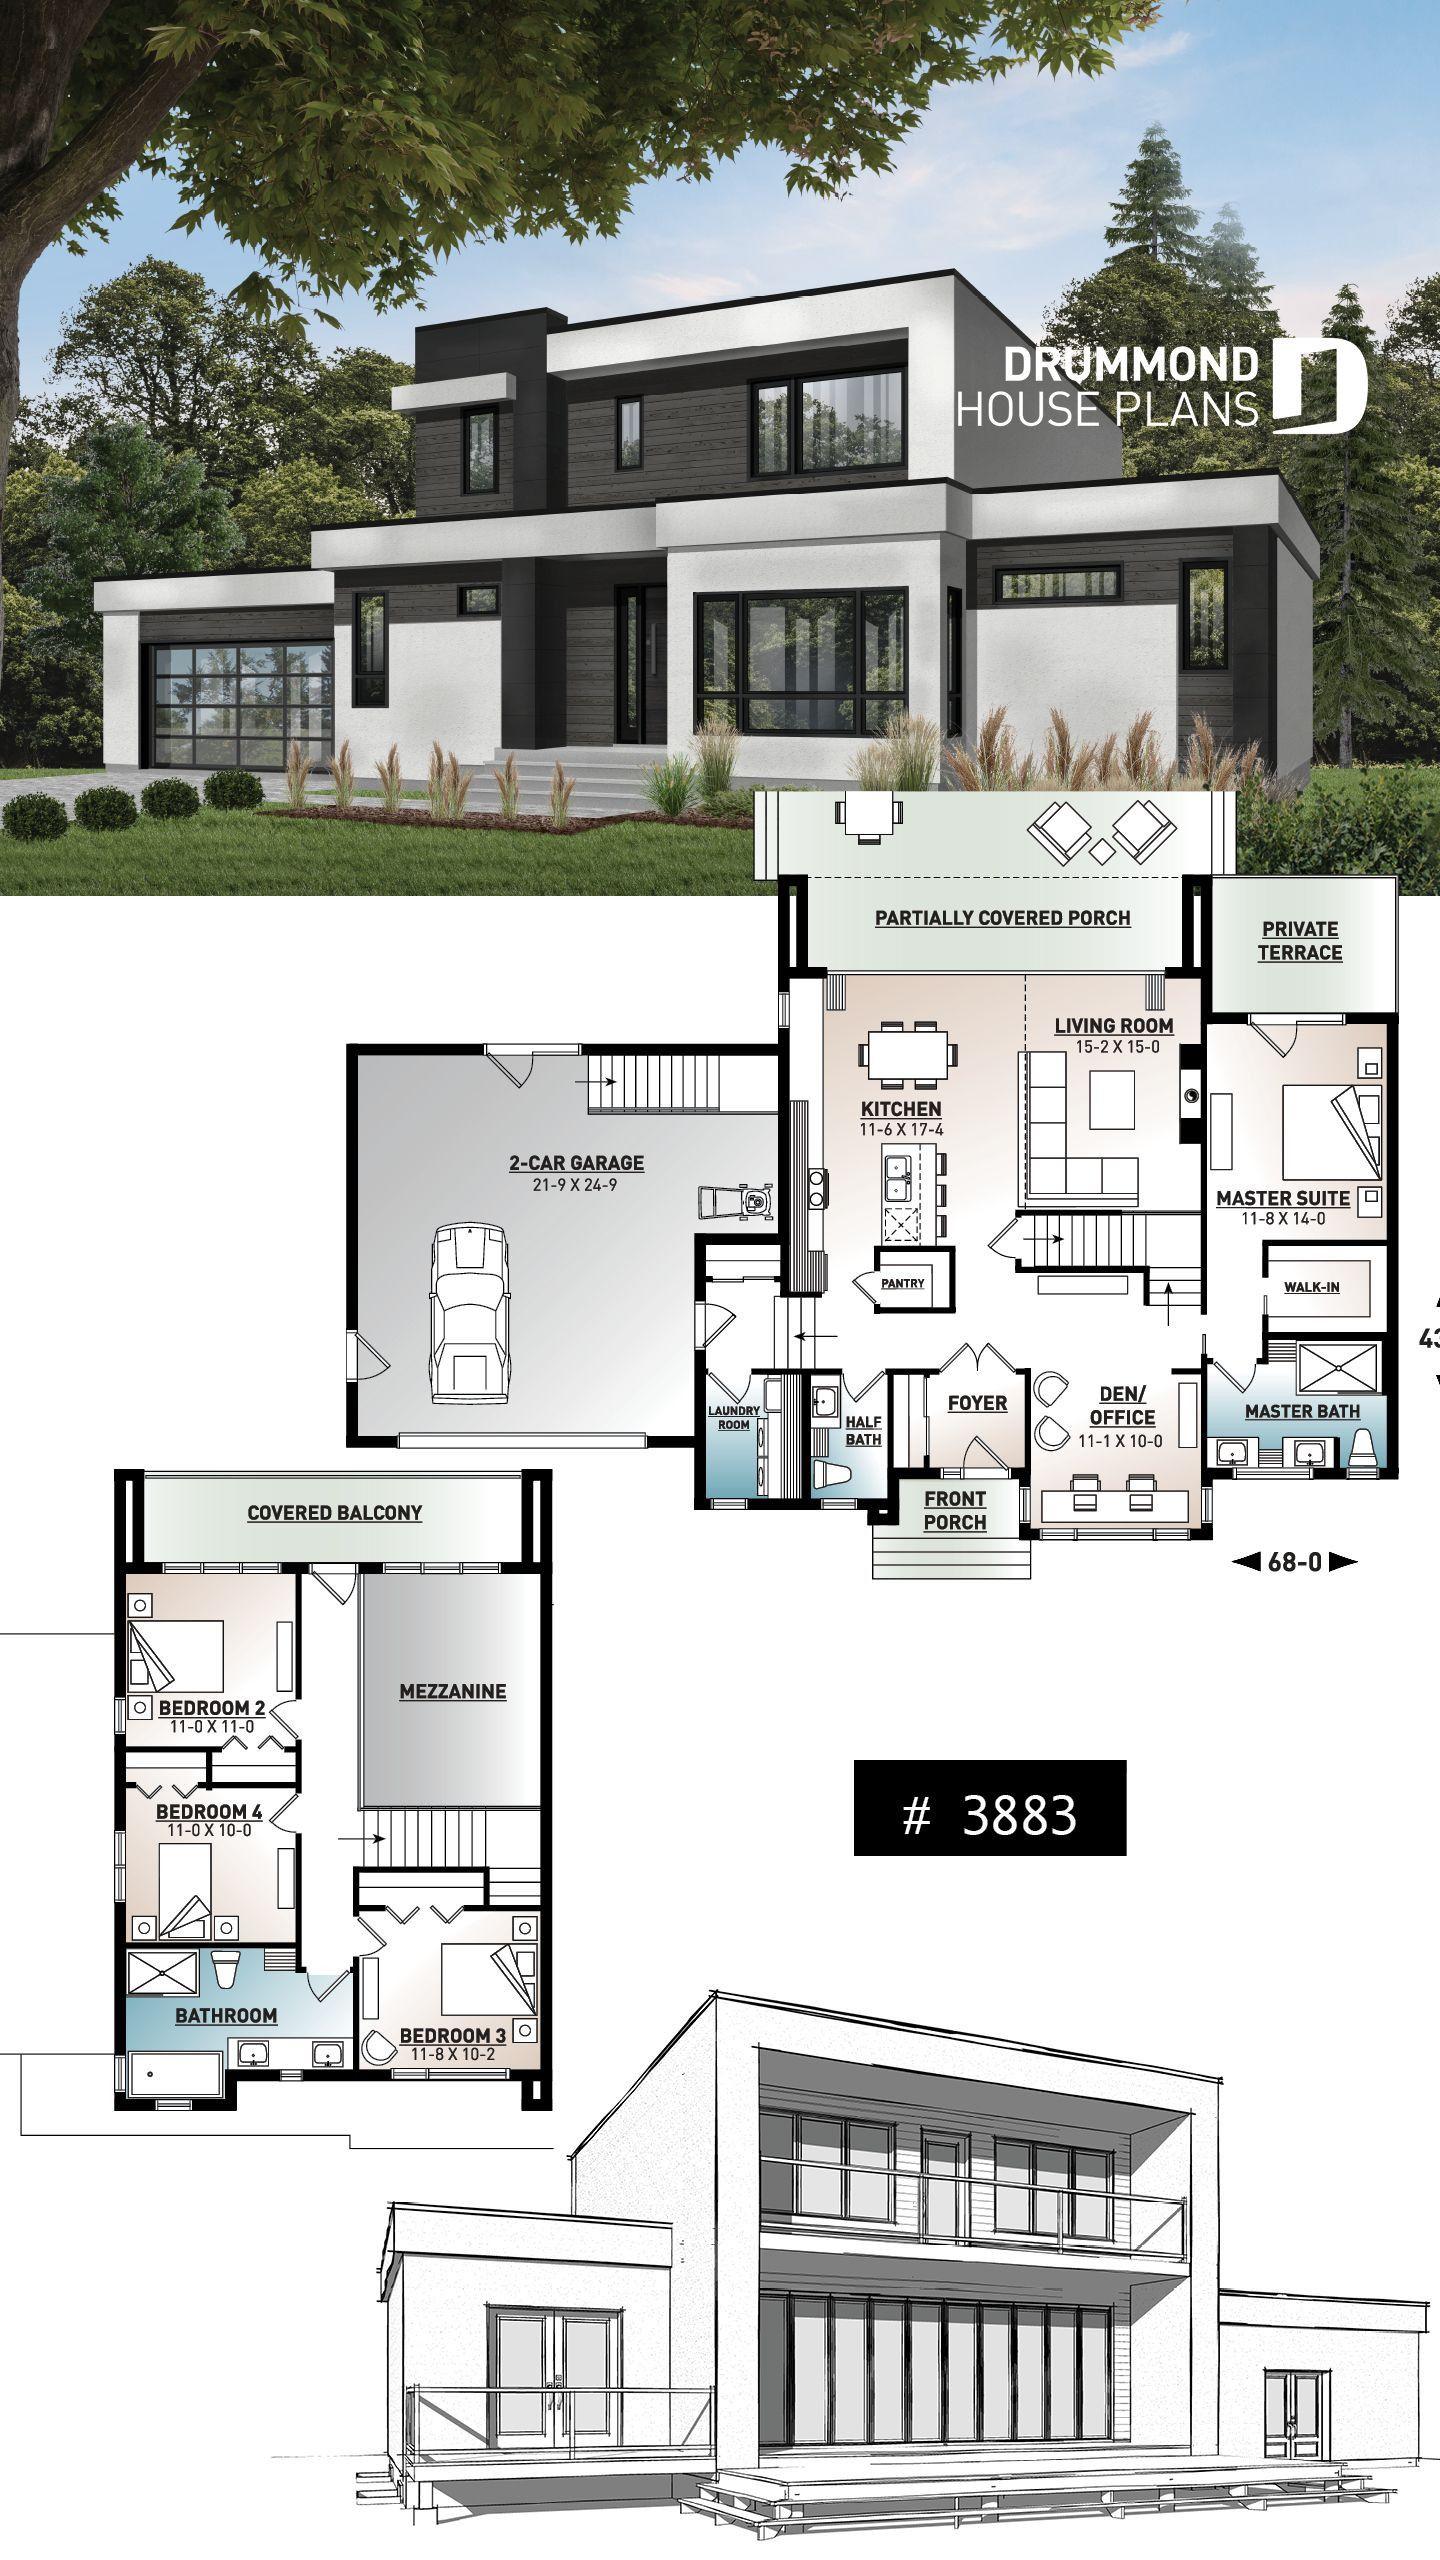 Fresh Modern House Design Plans Open Floor House Plan Es No 3883 Modern House Floor Plans Contemporary House Plans Modern Architecture House